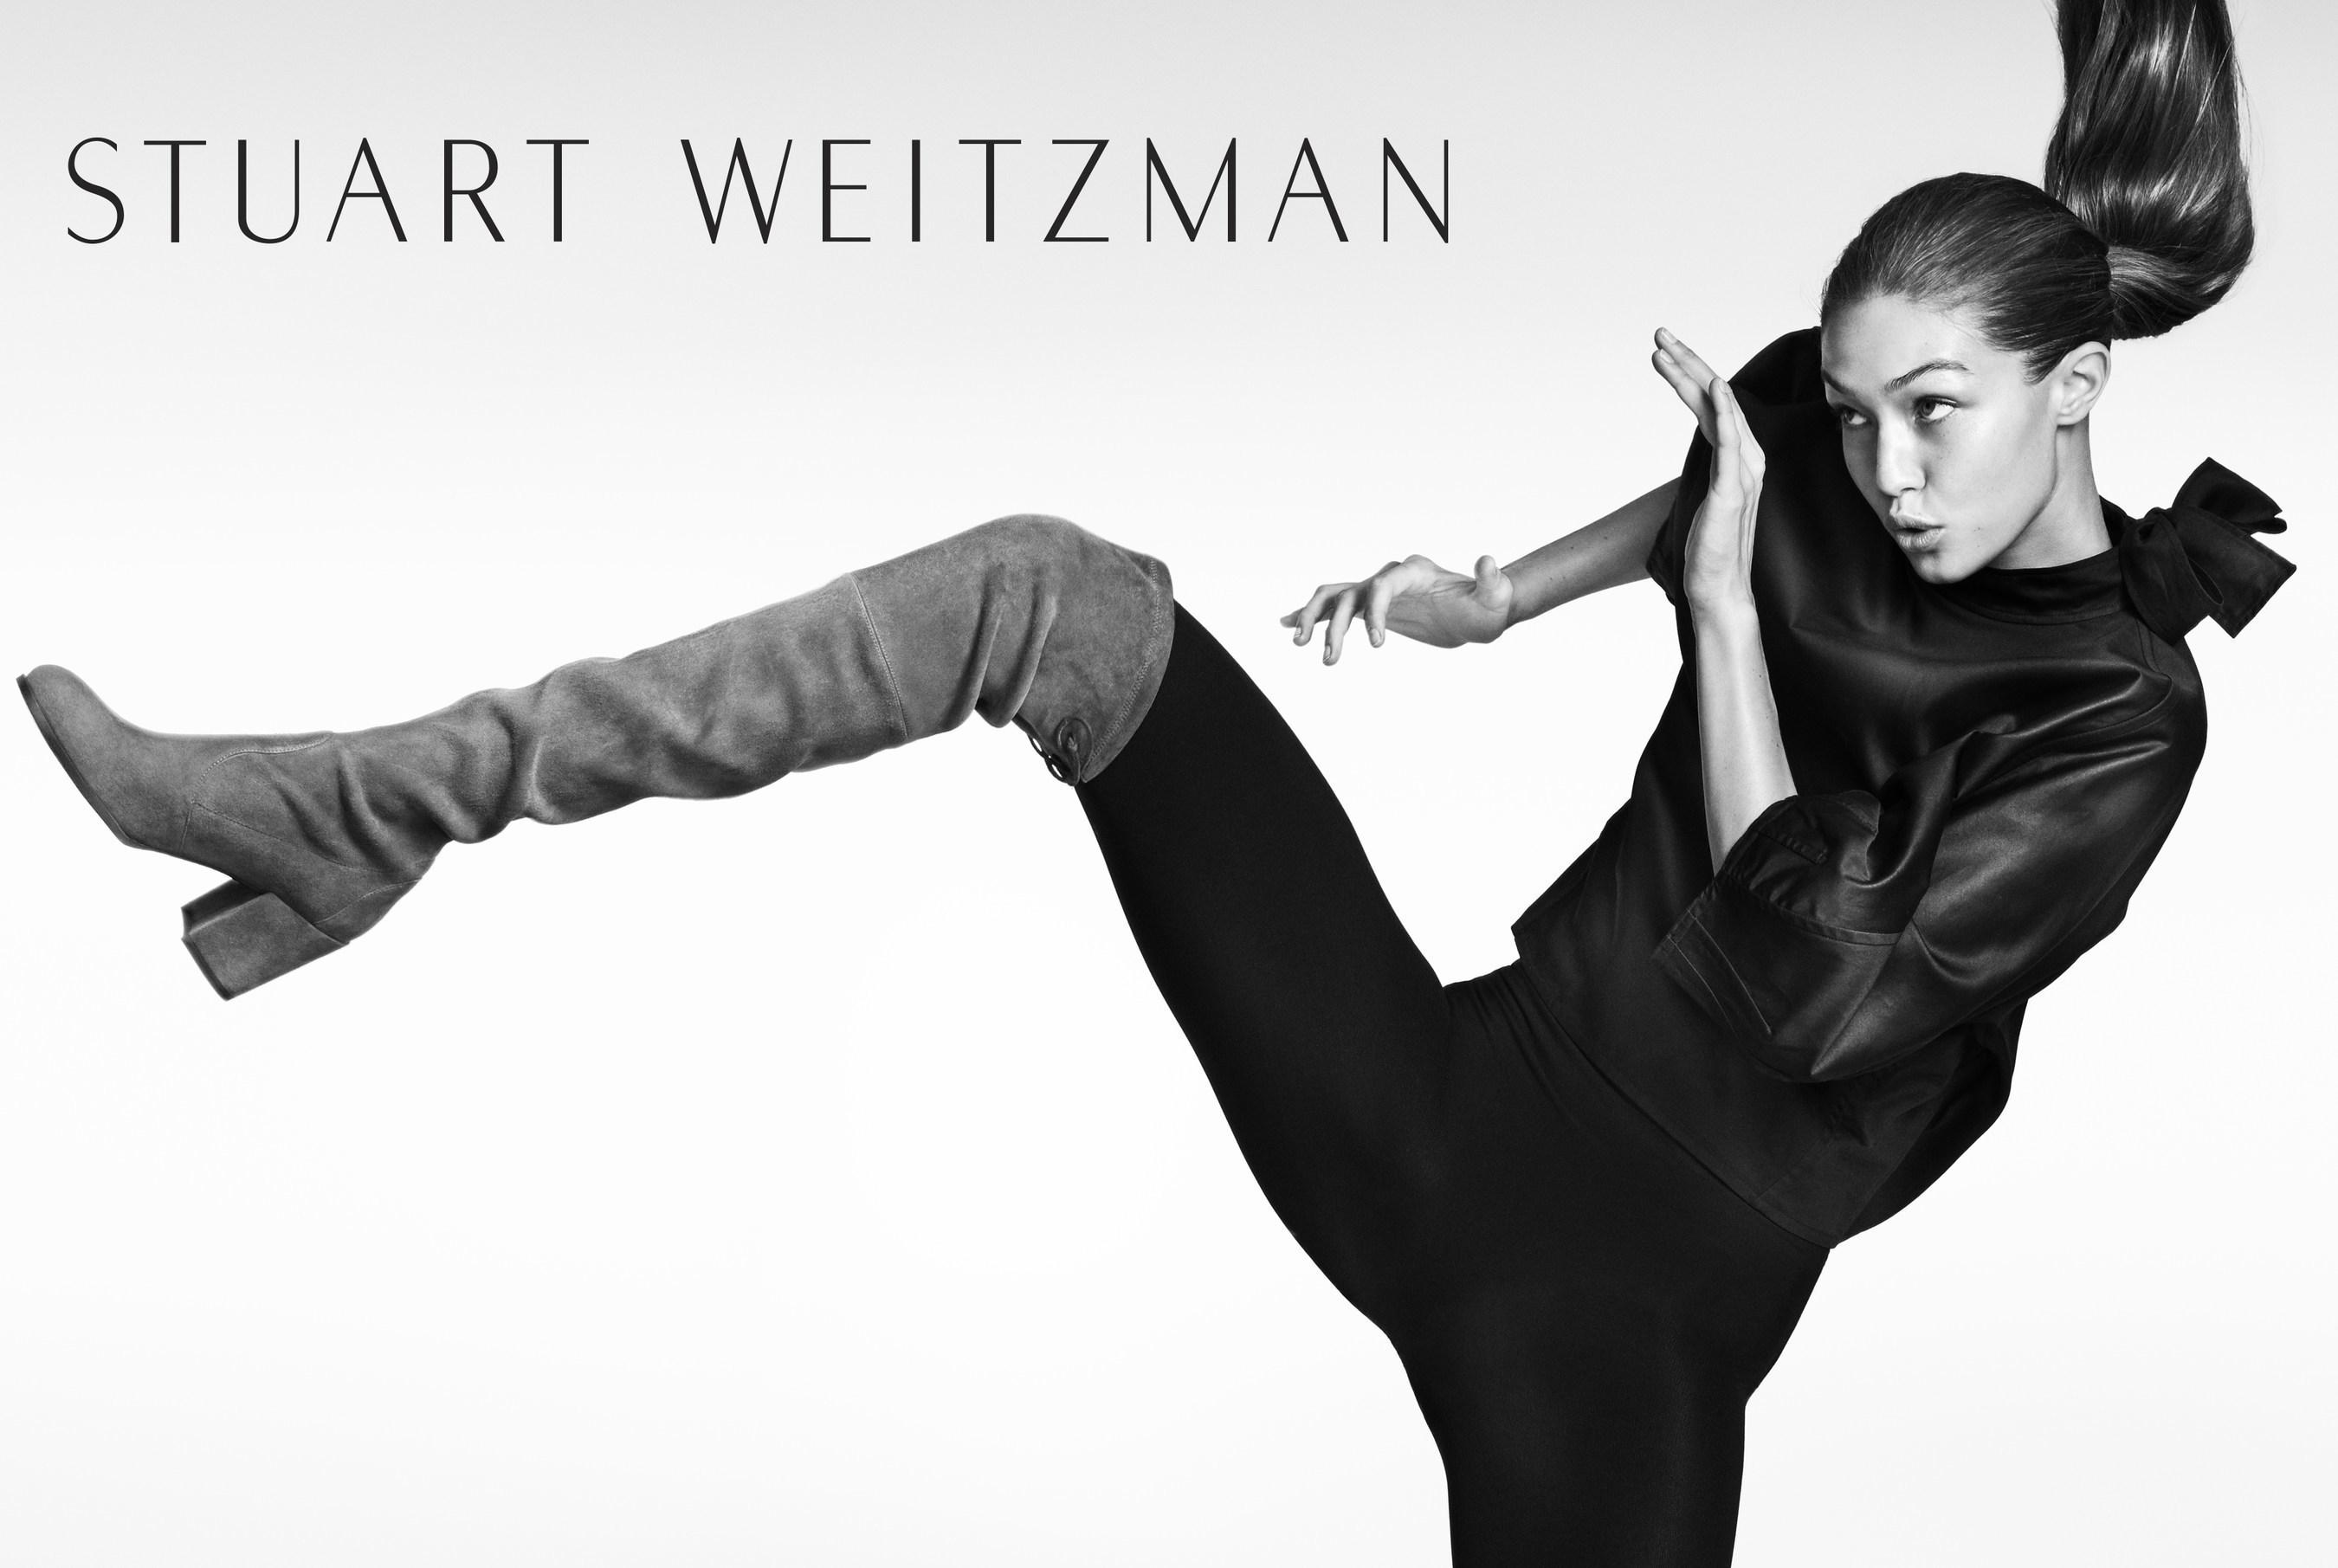 Stuart Weitzman Kick Starts Fall 2016 with a Campaign Starring Gigi Hadid